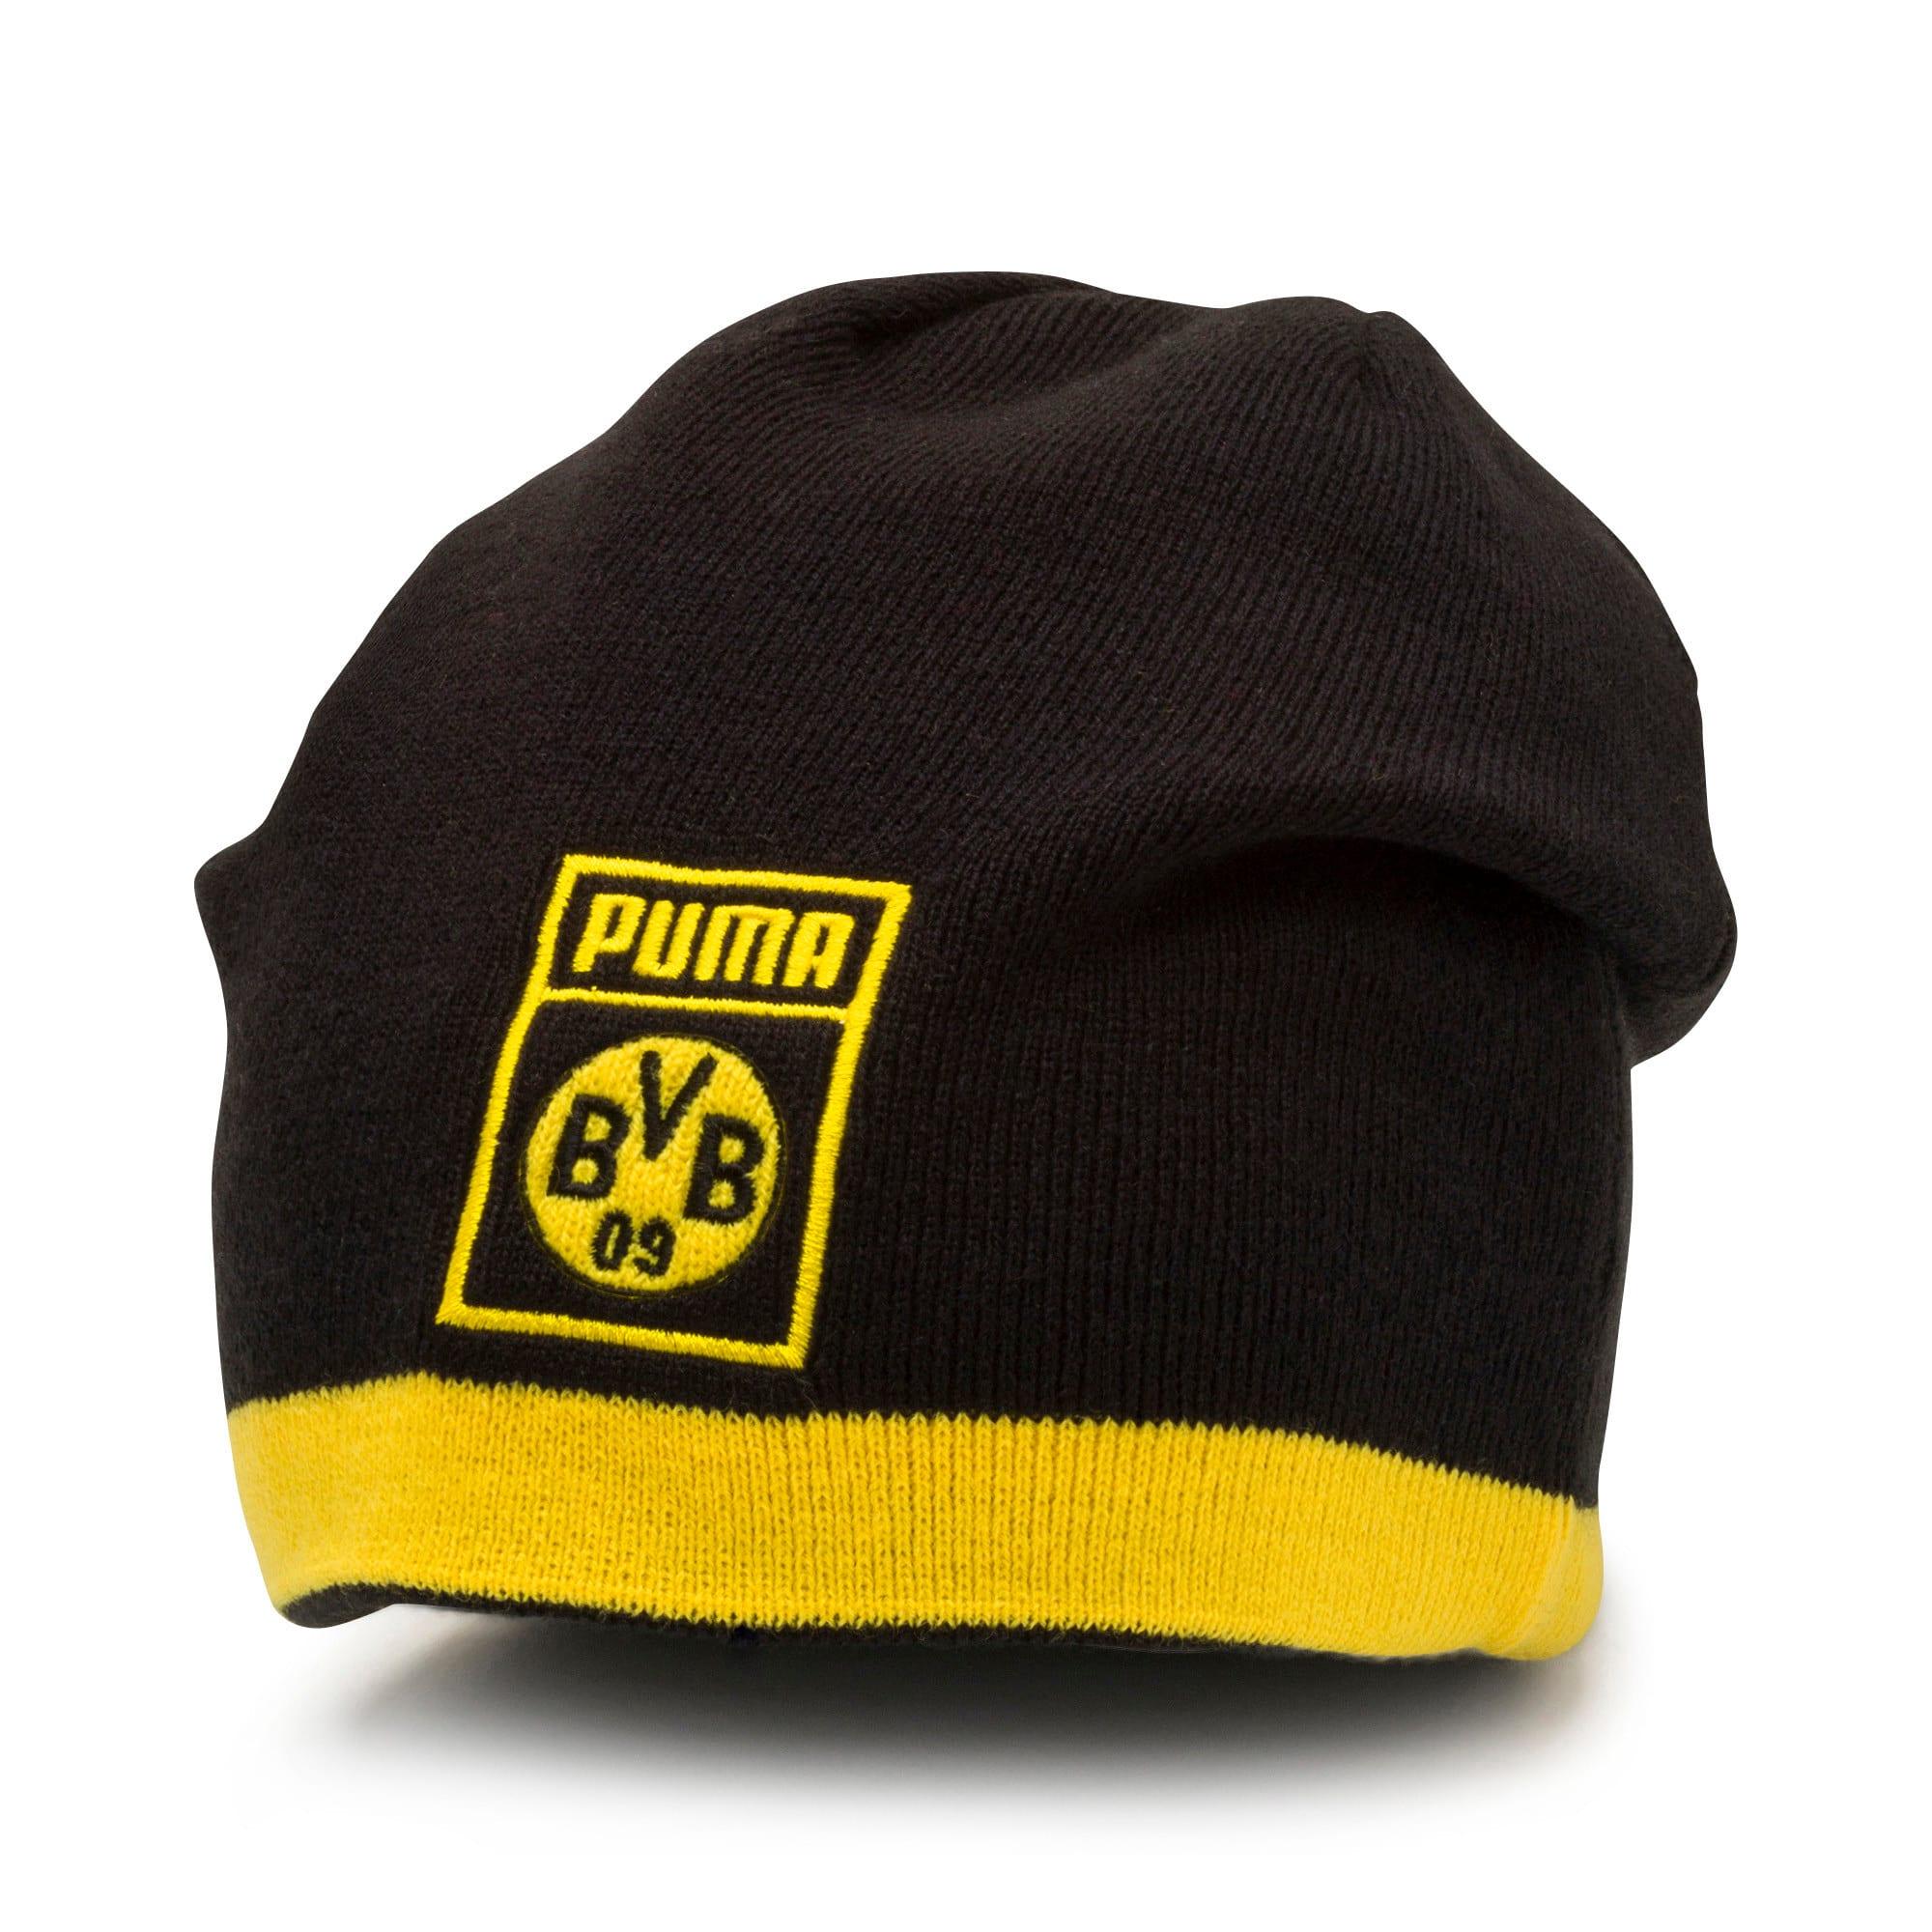 Thumbnail 3 of BVB Reversible Beanie, Puma Black-Cyber Yellow, medium